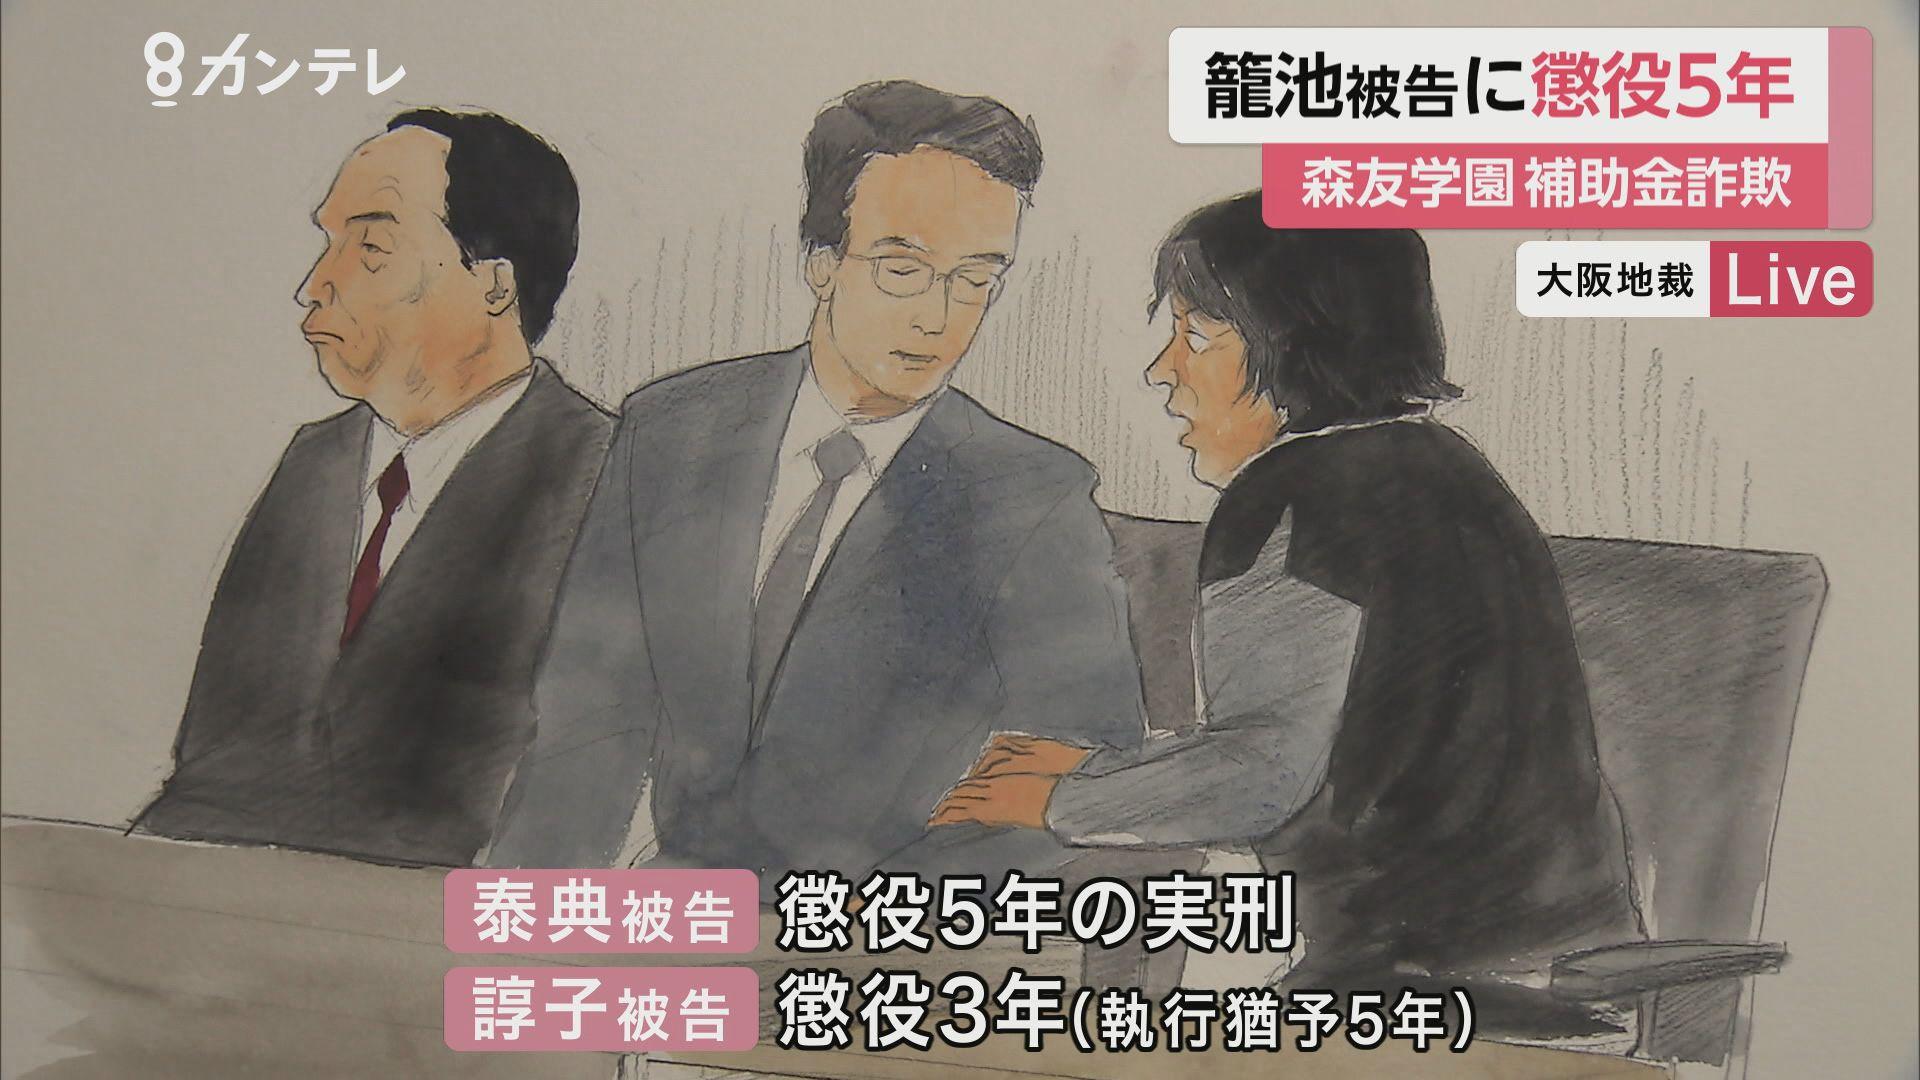 妻・諄子被告は「判決前に号泣」も…森友学園・詐欺事件、籠池被告に「実刑判決」